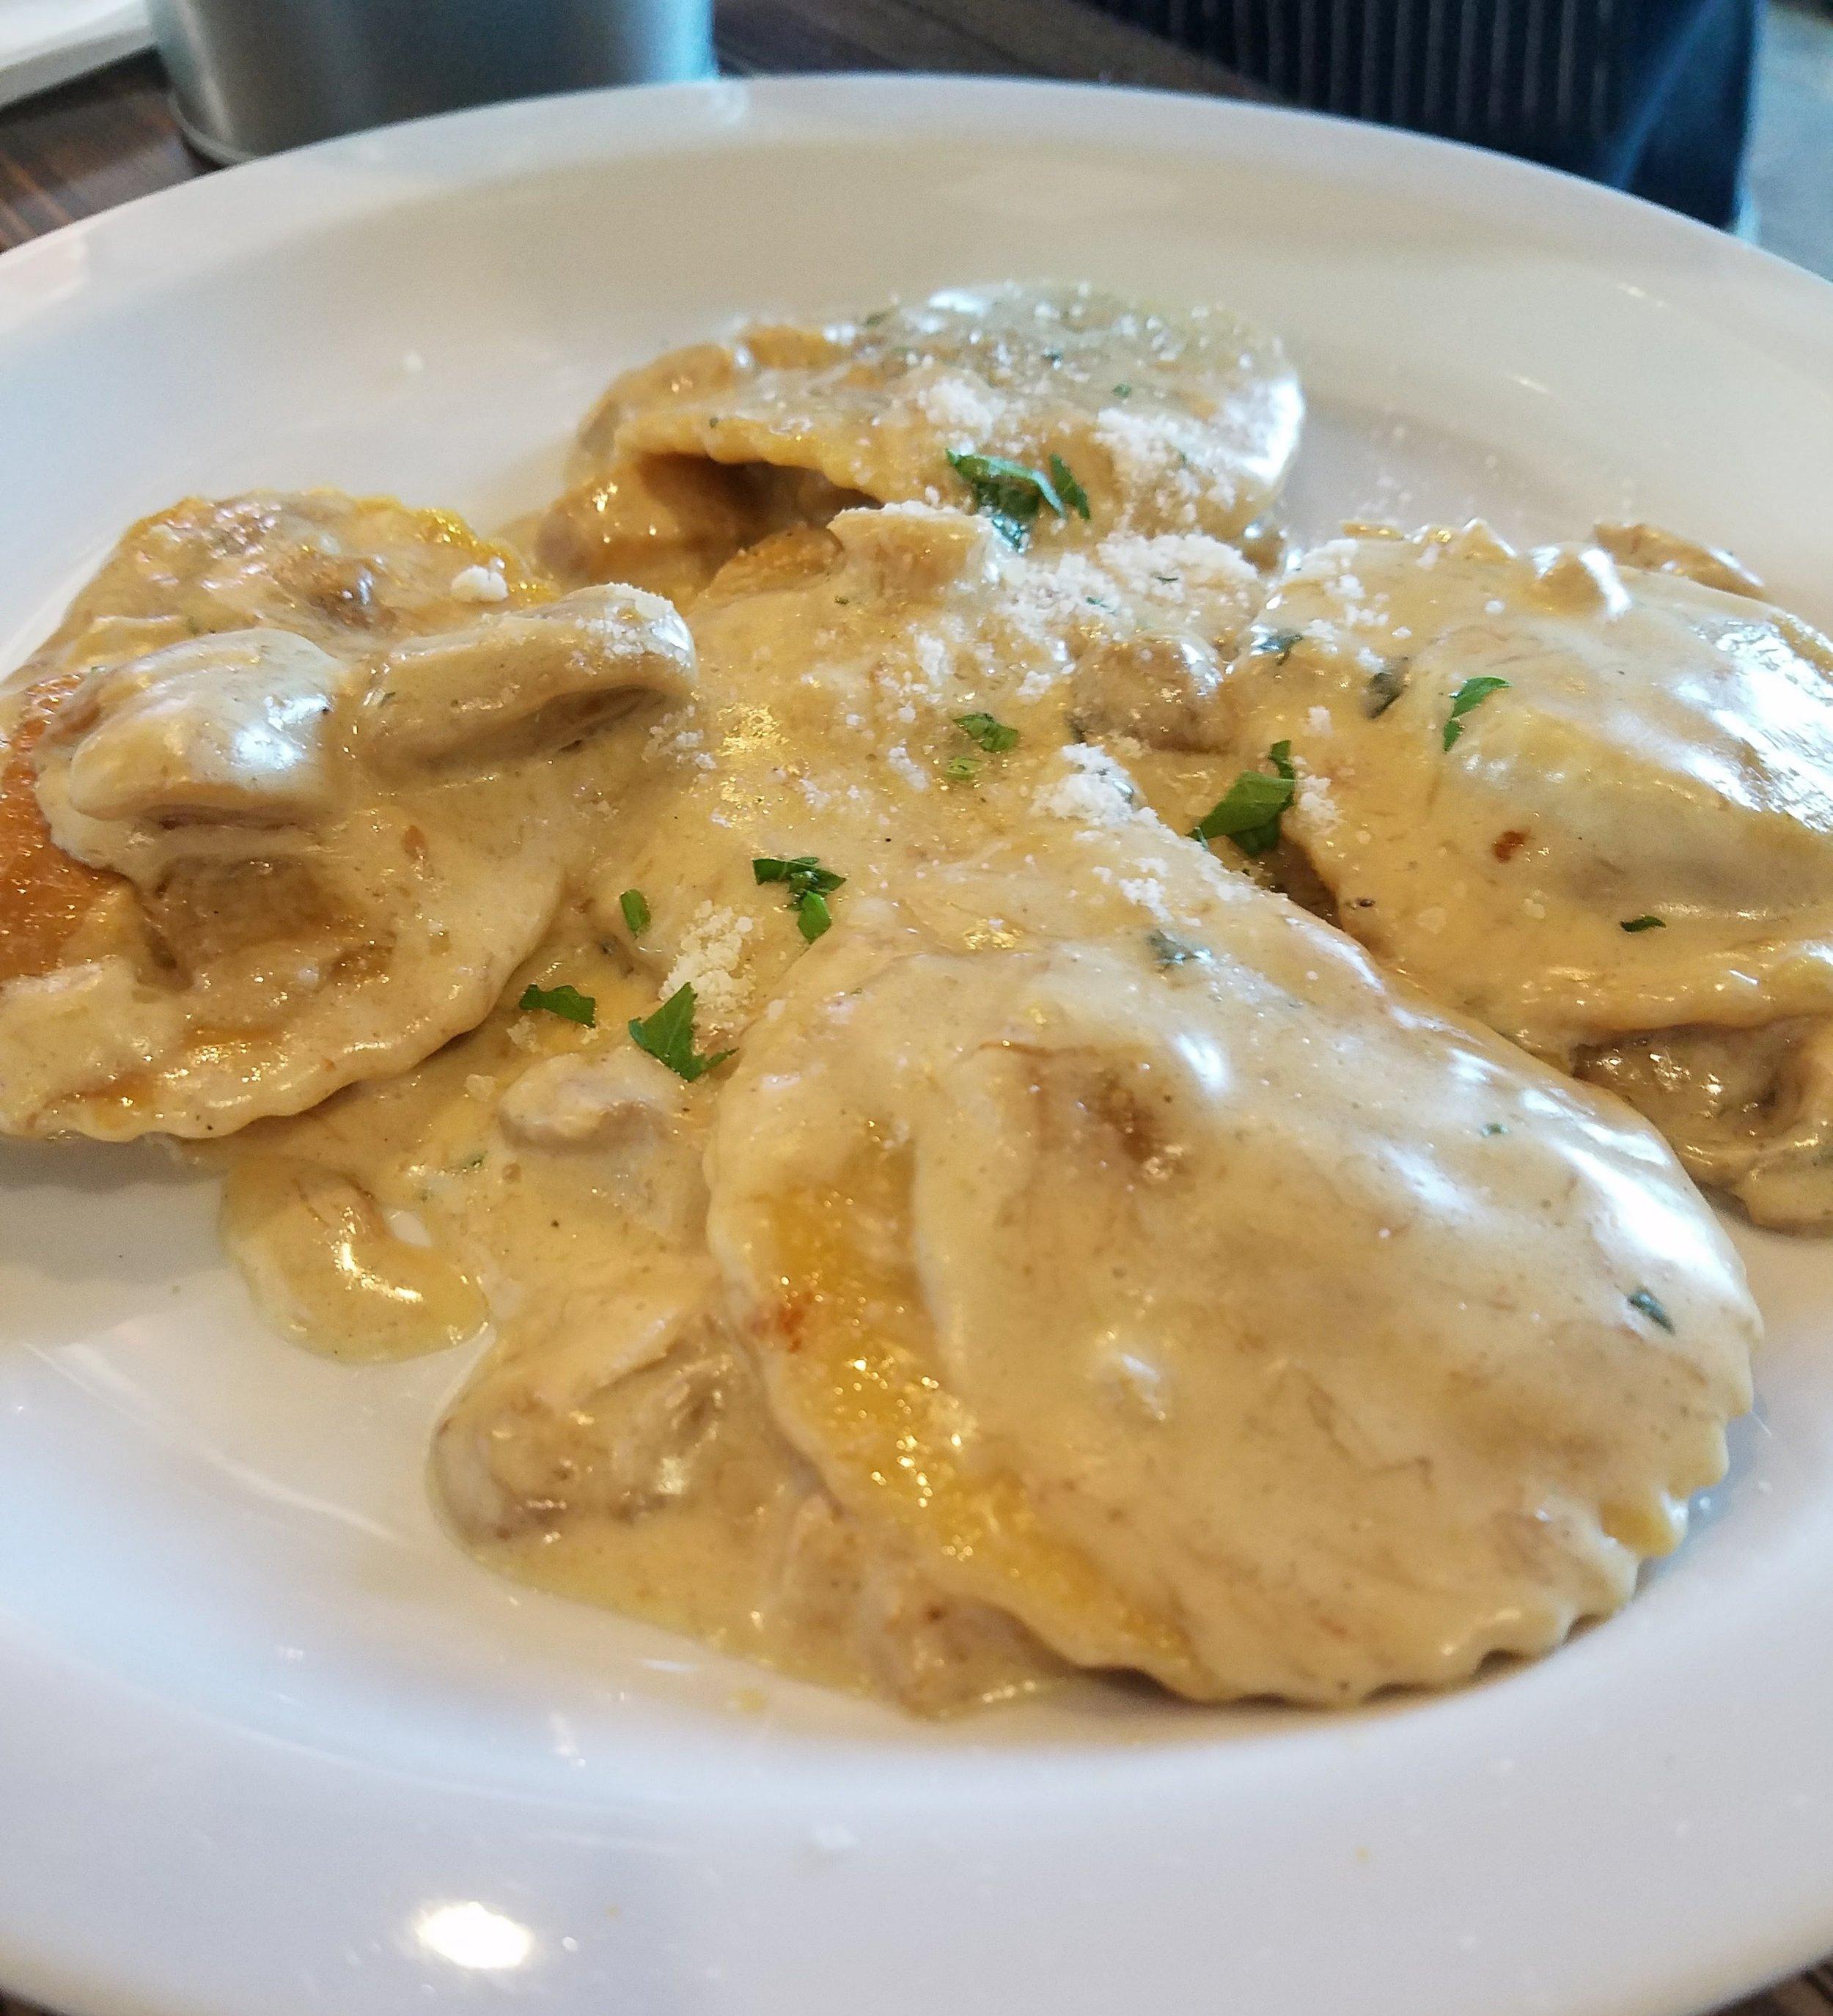 Short rib ravioli with porcini cream sauce (a special)